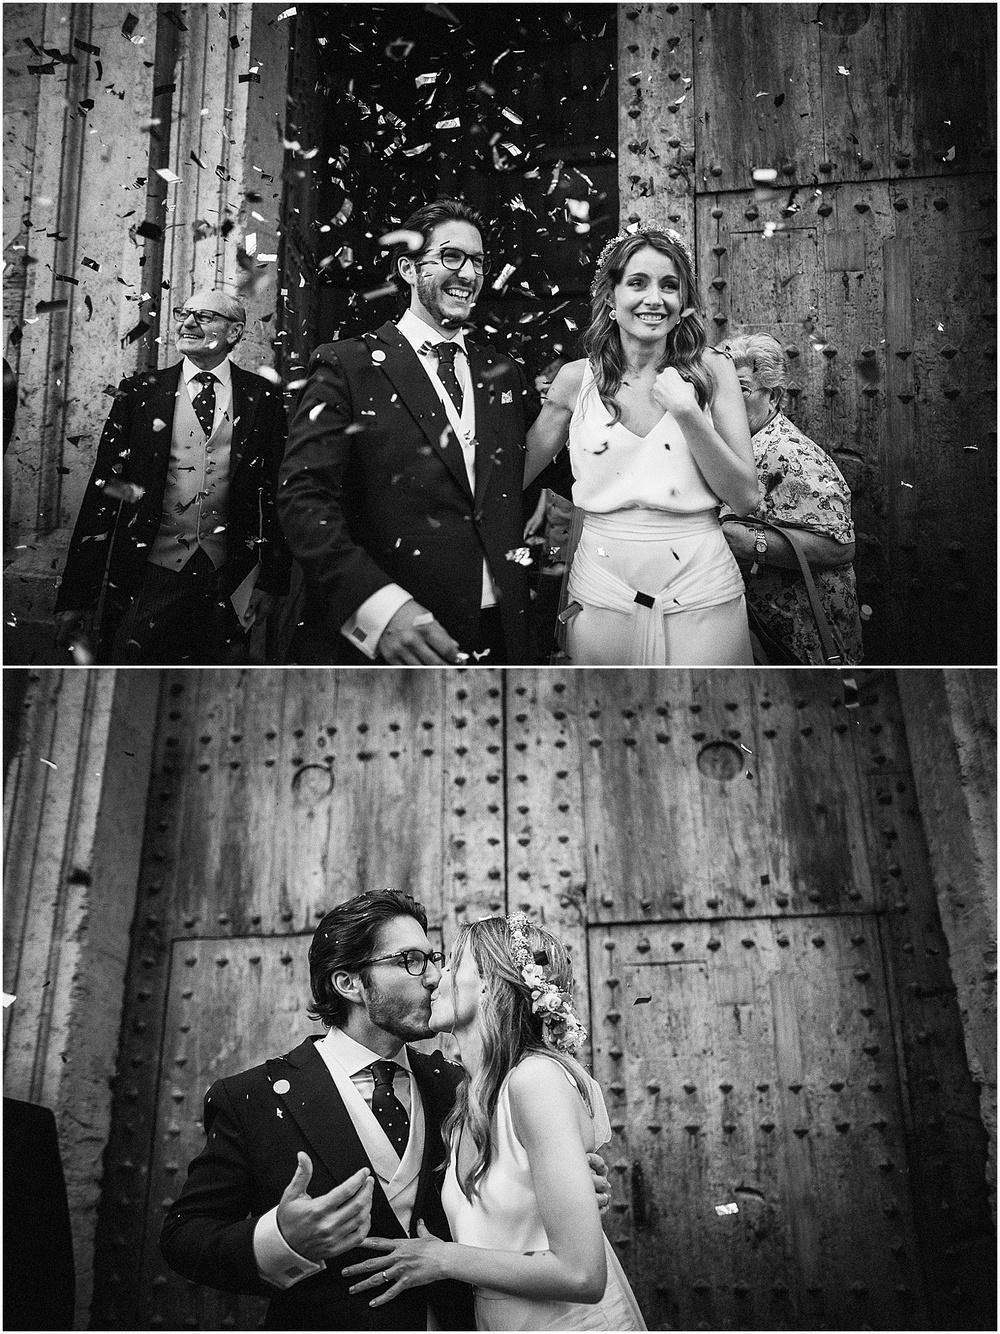 Macarena y Jordi - boda en valencia - Pablo Laguia (19).jpg